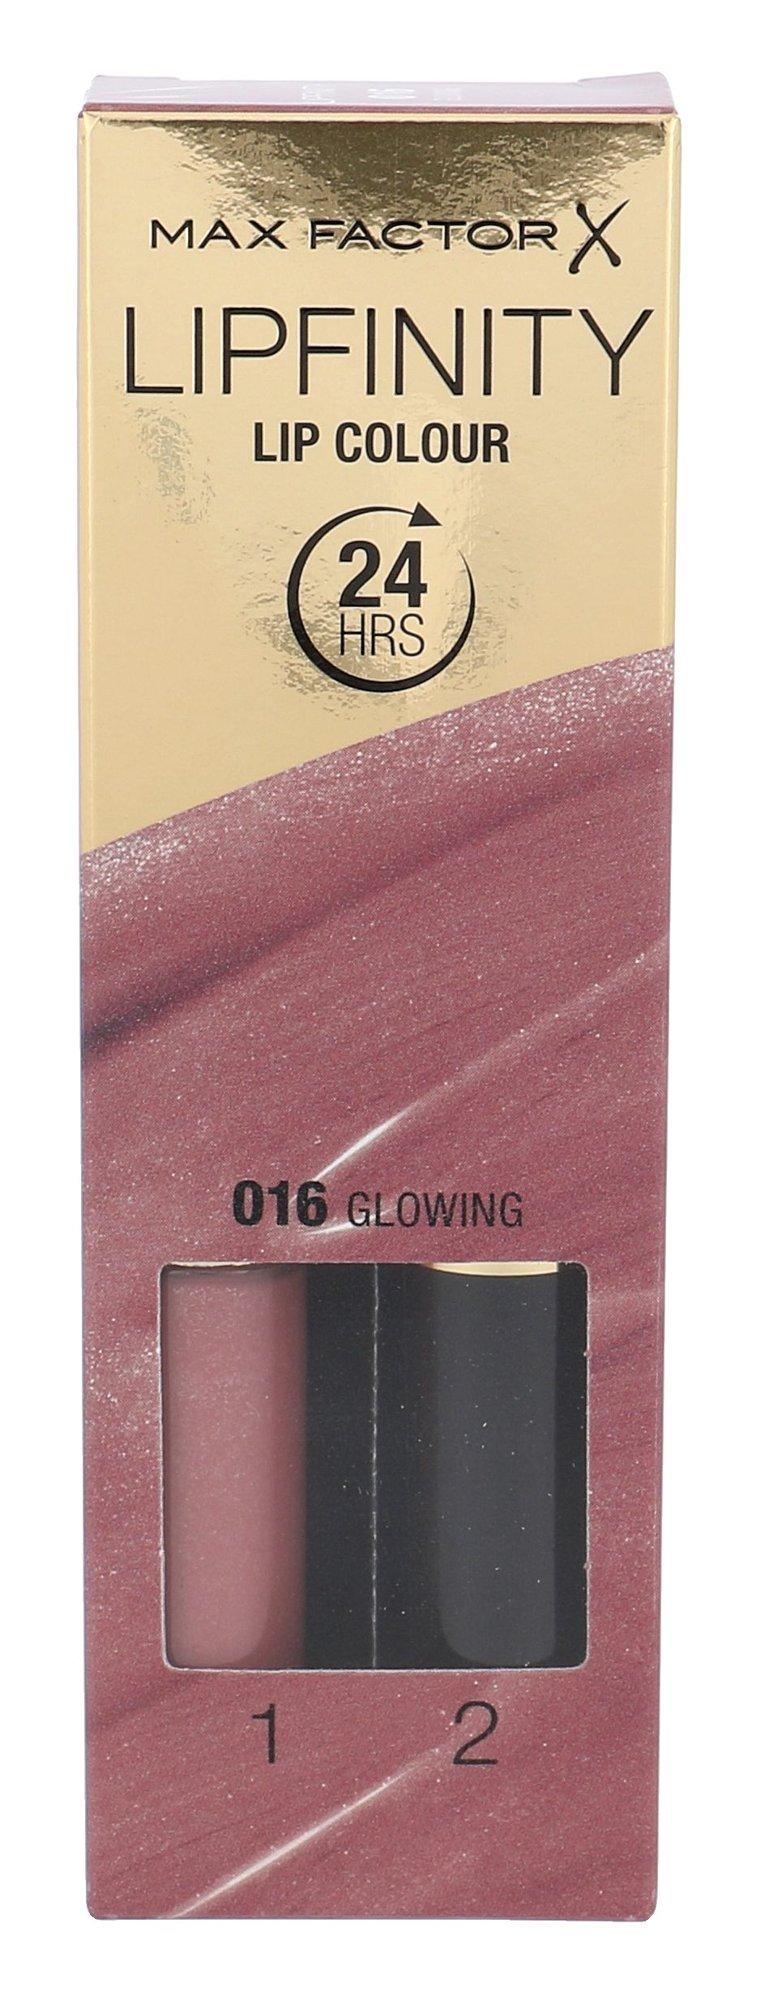 Max Factor Lipfinity Cosmetic 4,2ml 016 Glowing